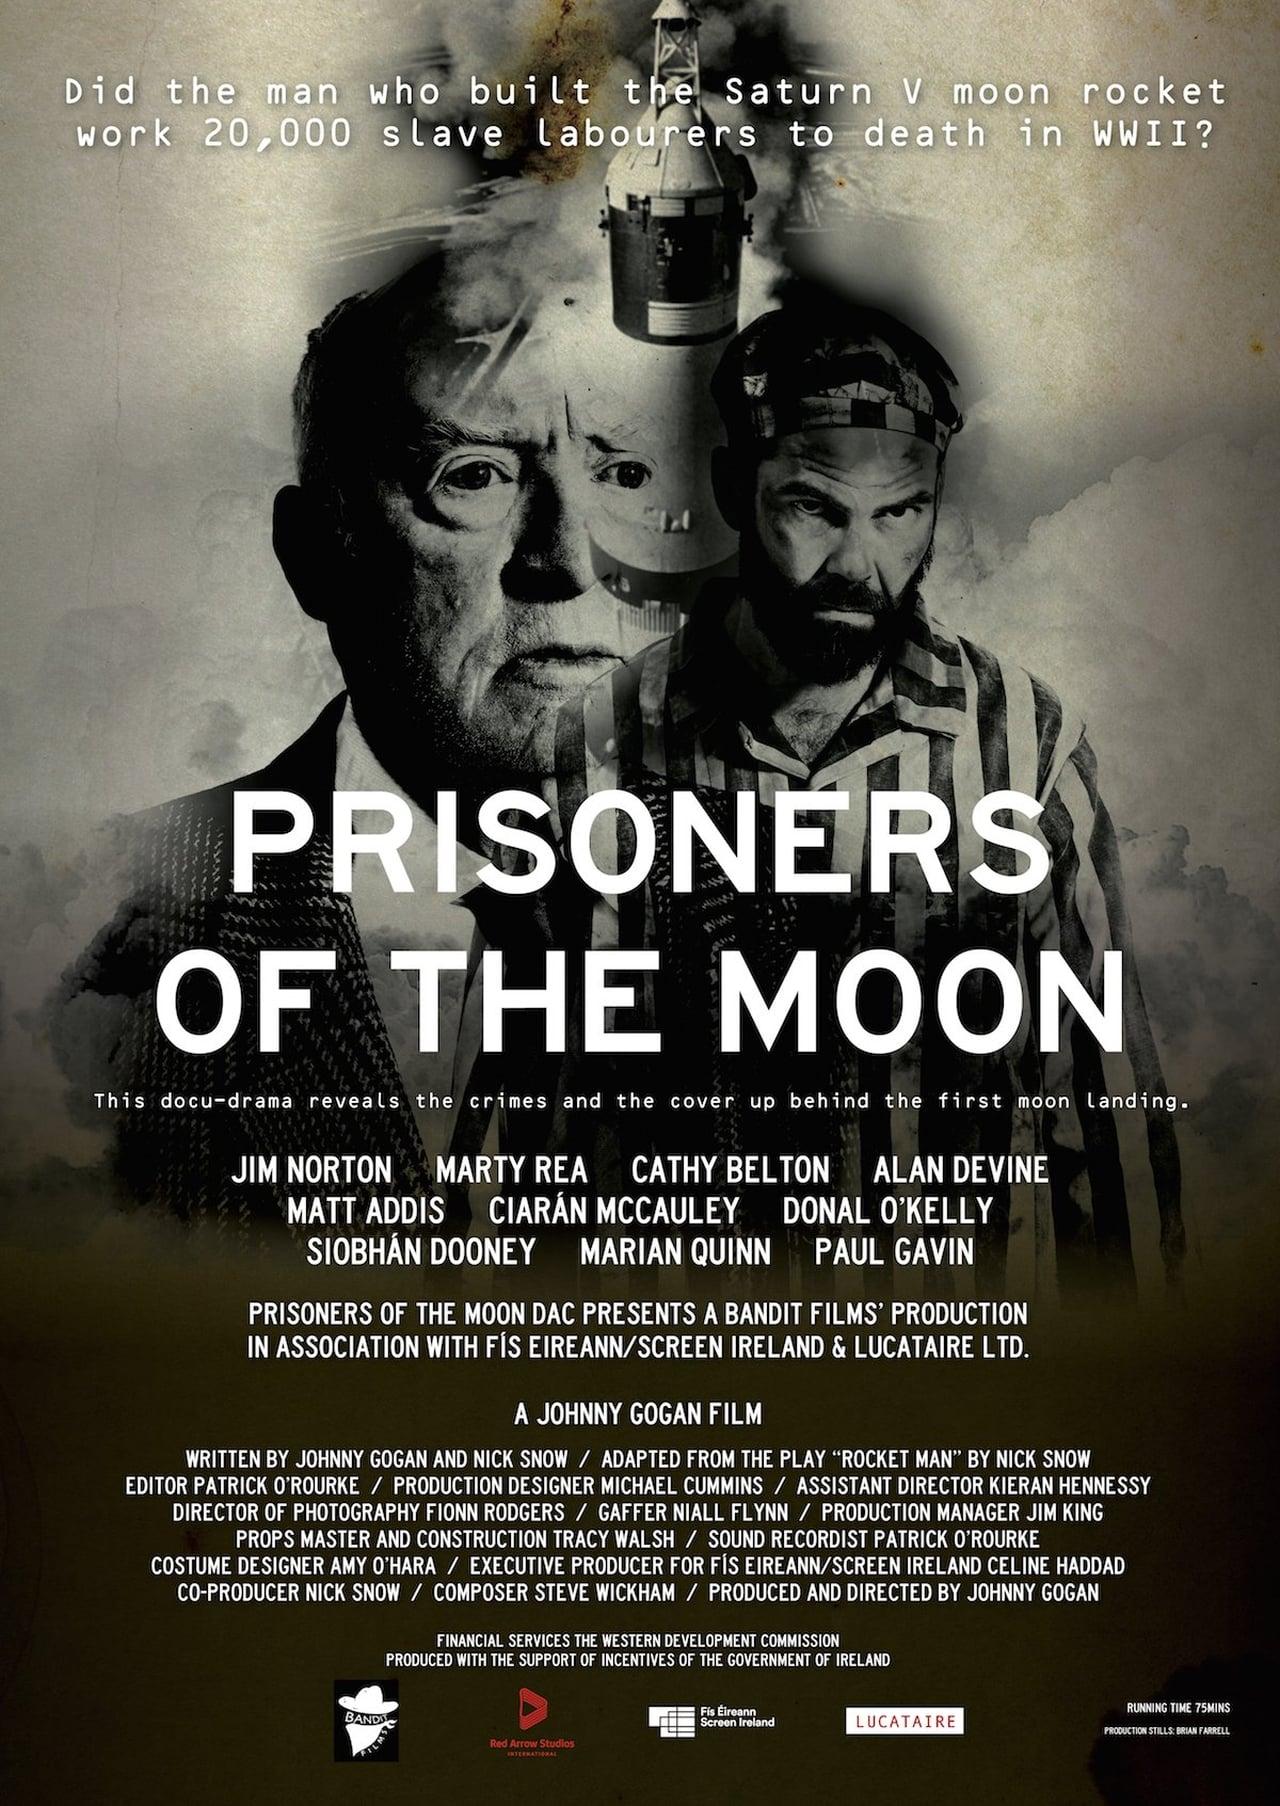 Prisoners of the Moon